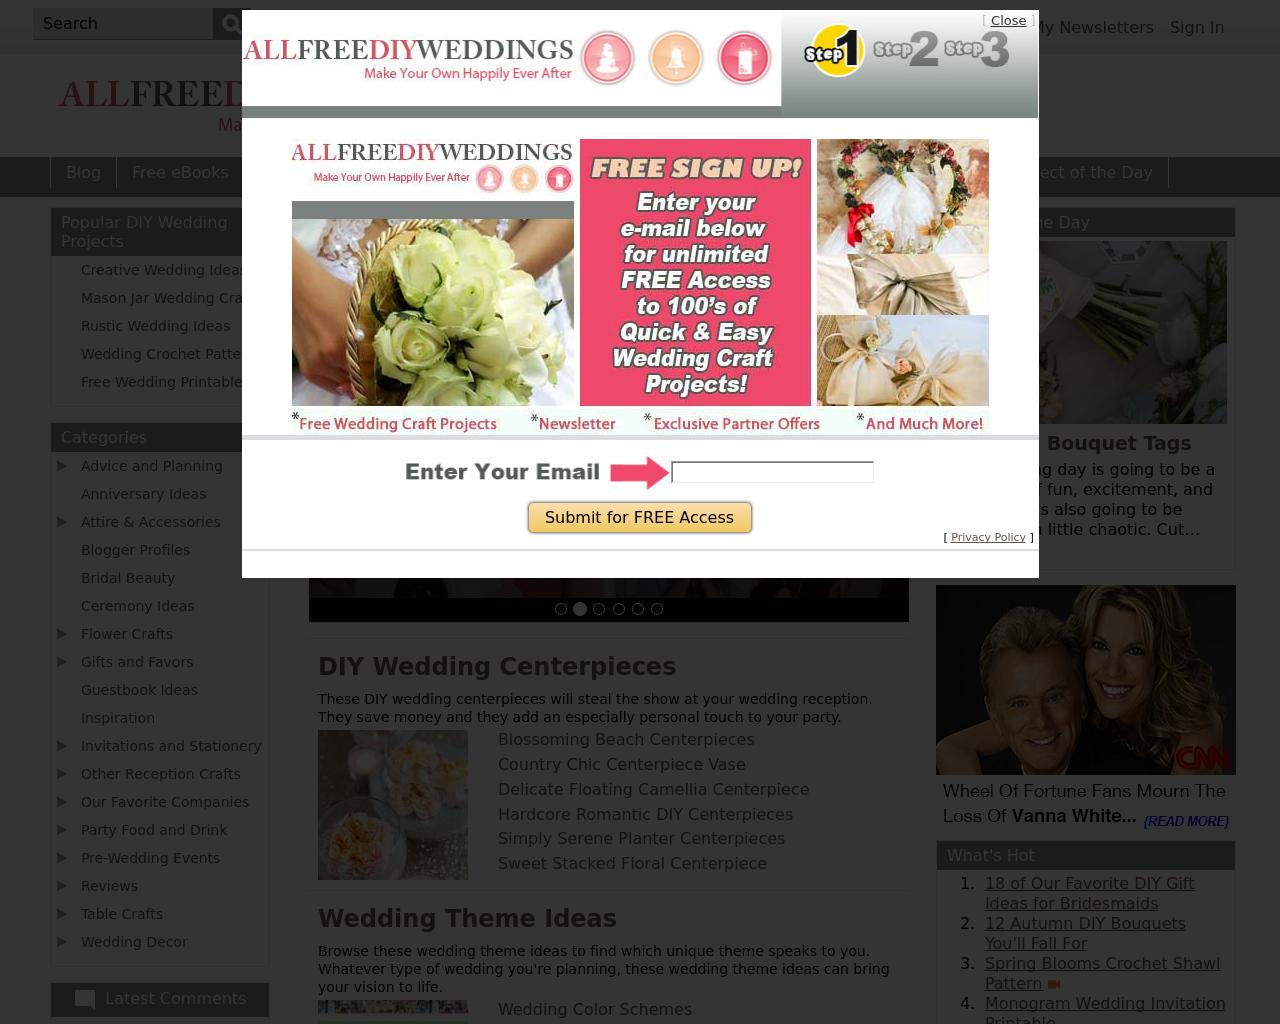 All-Free-DIY-Weddings-Advertising-Reviews-Pricing